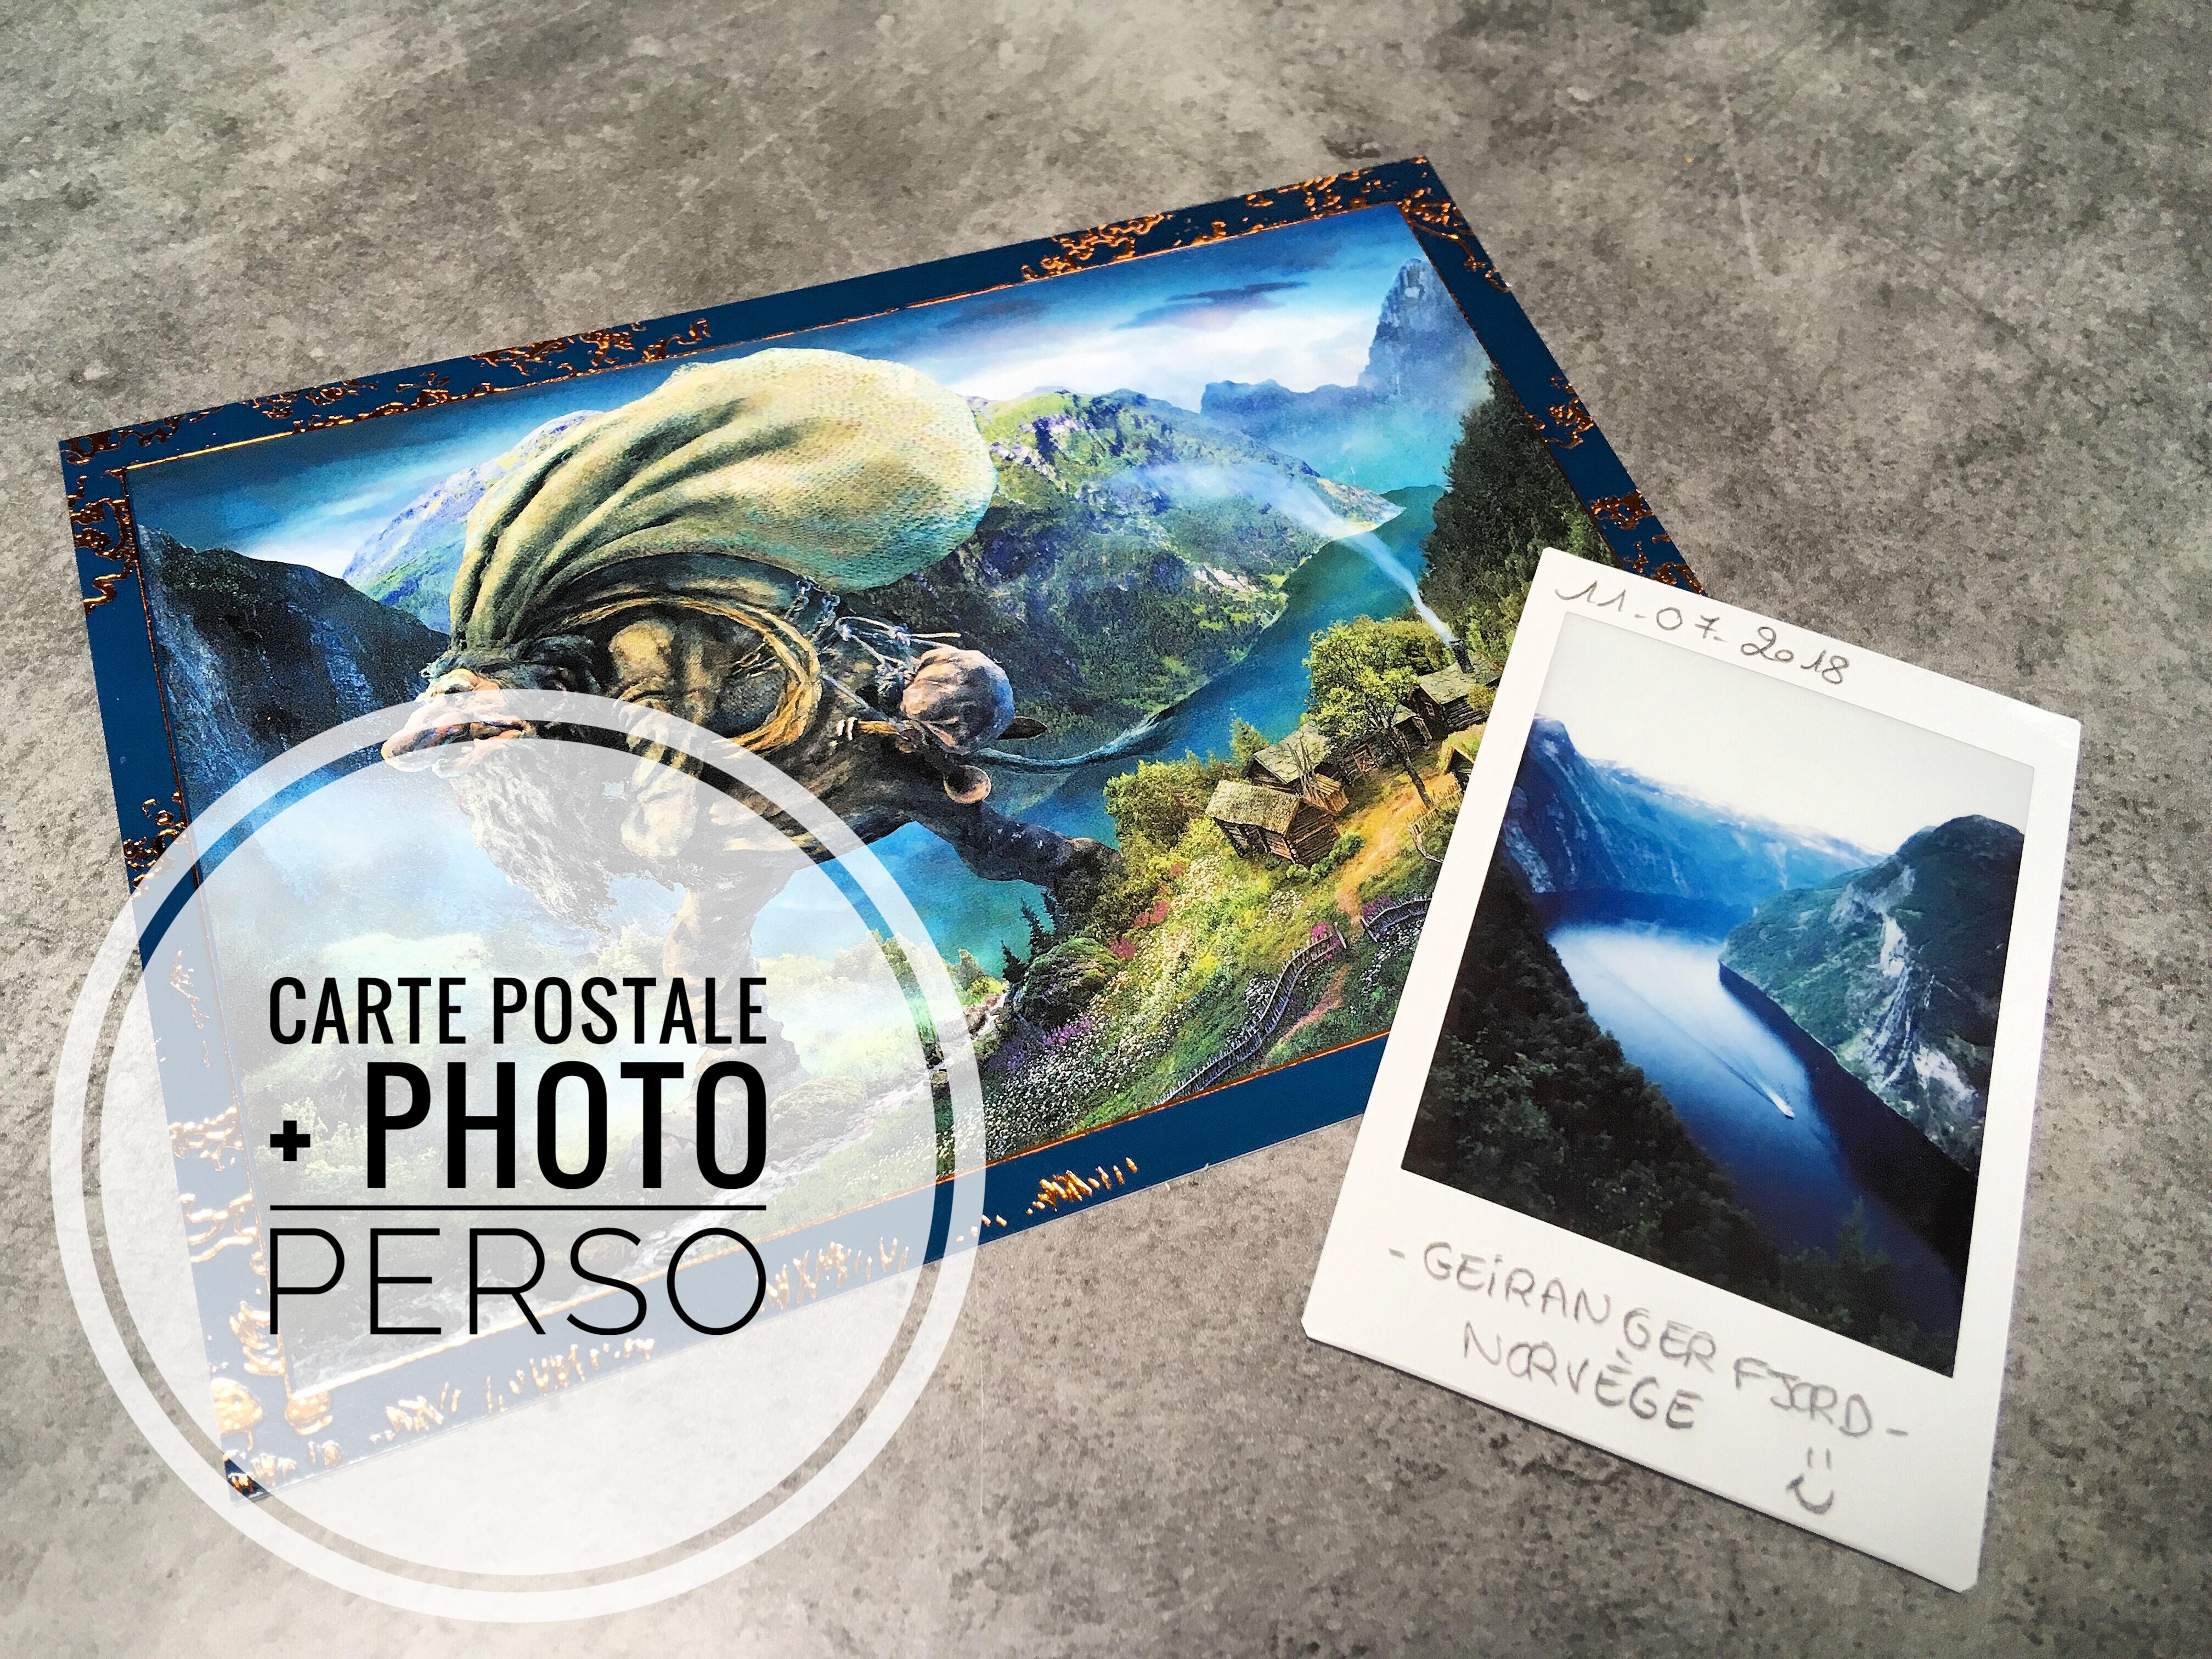 Carte postale + photo